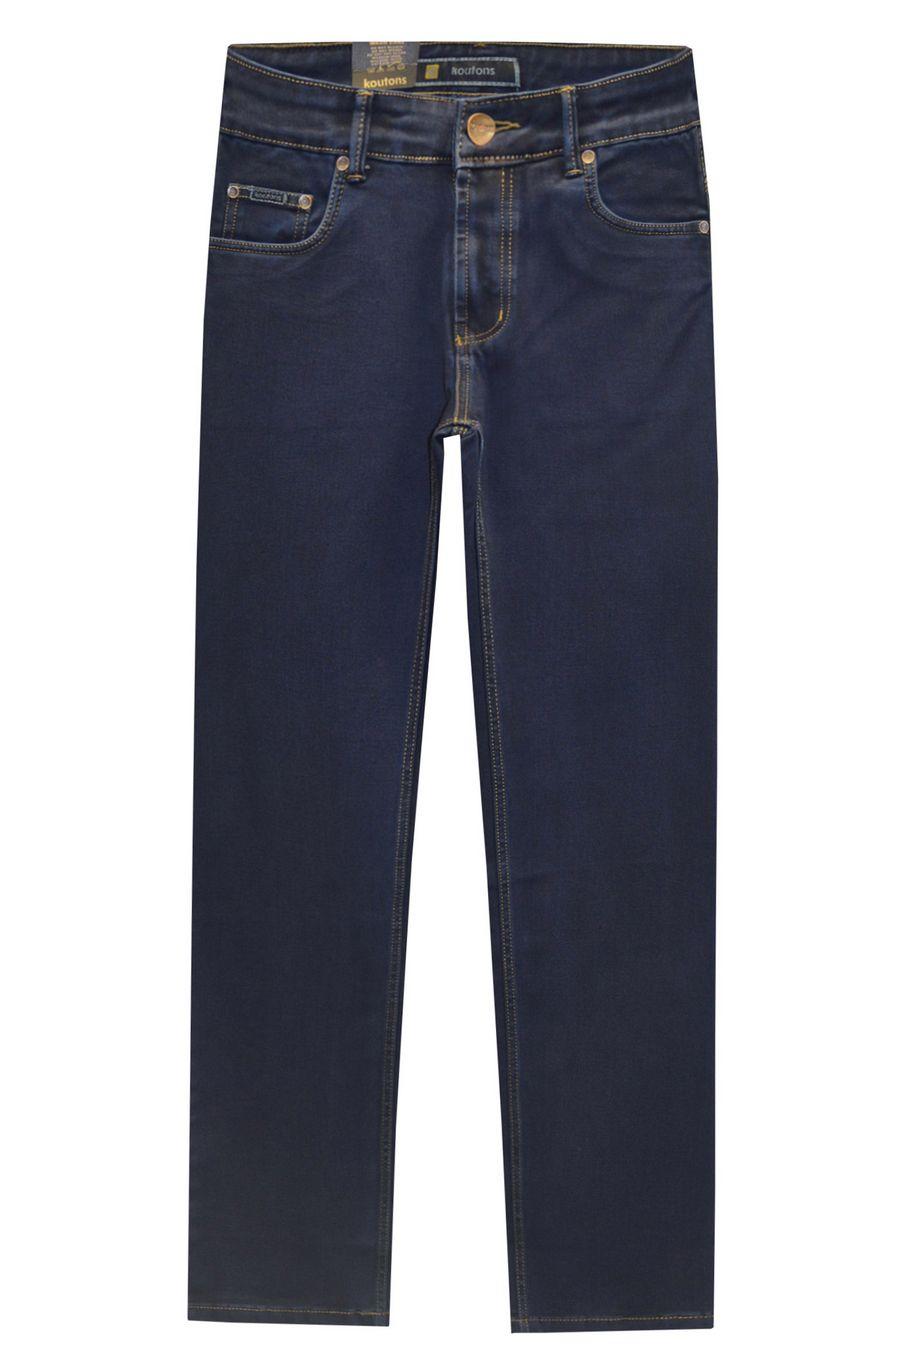 Джинсы мужские Koutons ST-0-590-7 Stretch Black-Blue (30-38) - фото 1